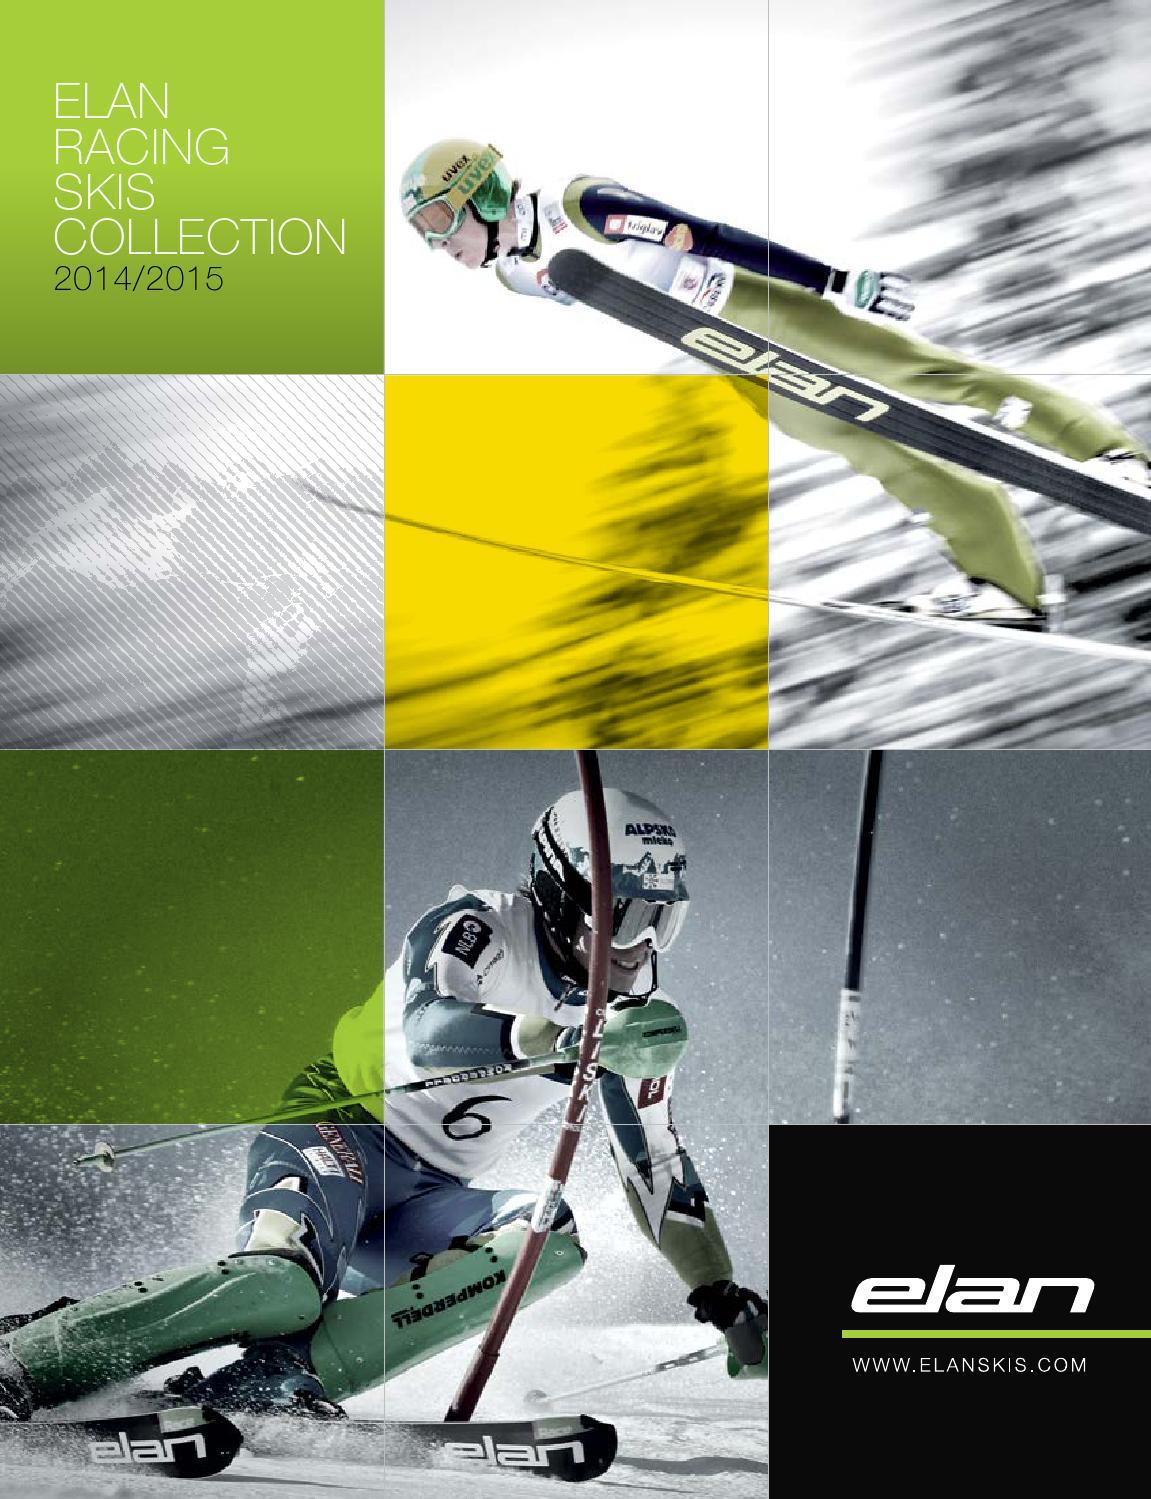 2013 2014 2015 New Elan Race GSX Amphibio Plate FIS racing skis 183 188 195 cm